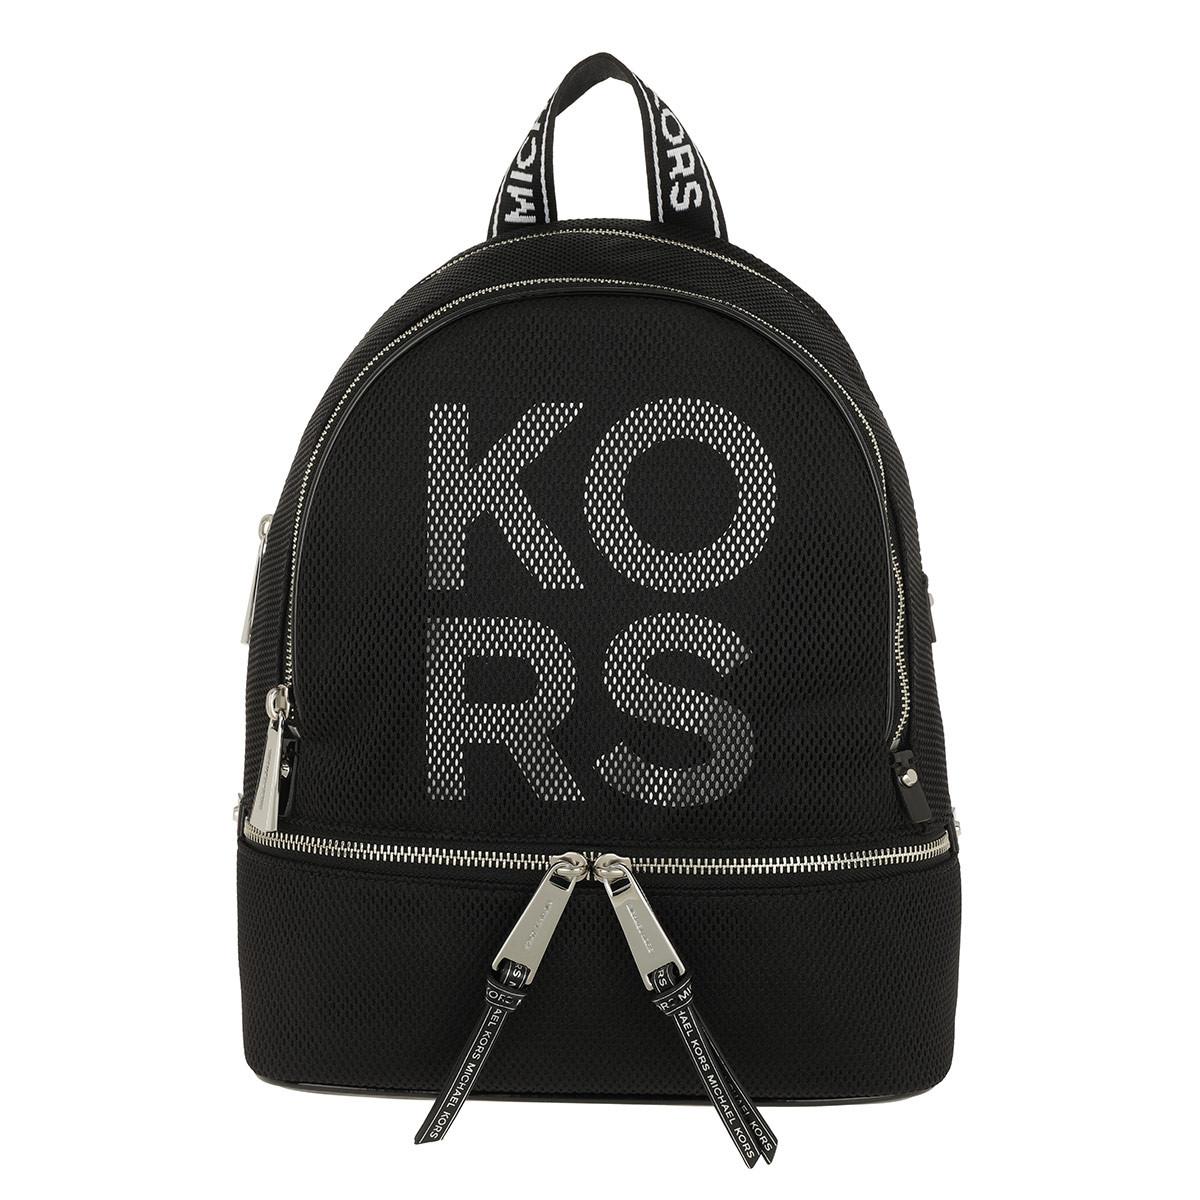 Michael Kors Rucksack - Rhea Zip Medium Backpack Black/Optic White - in schwarz - für Damen